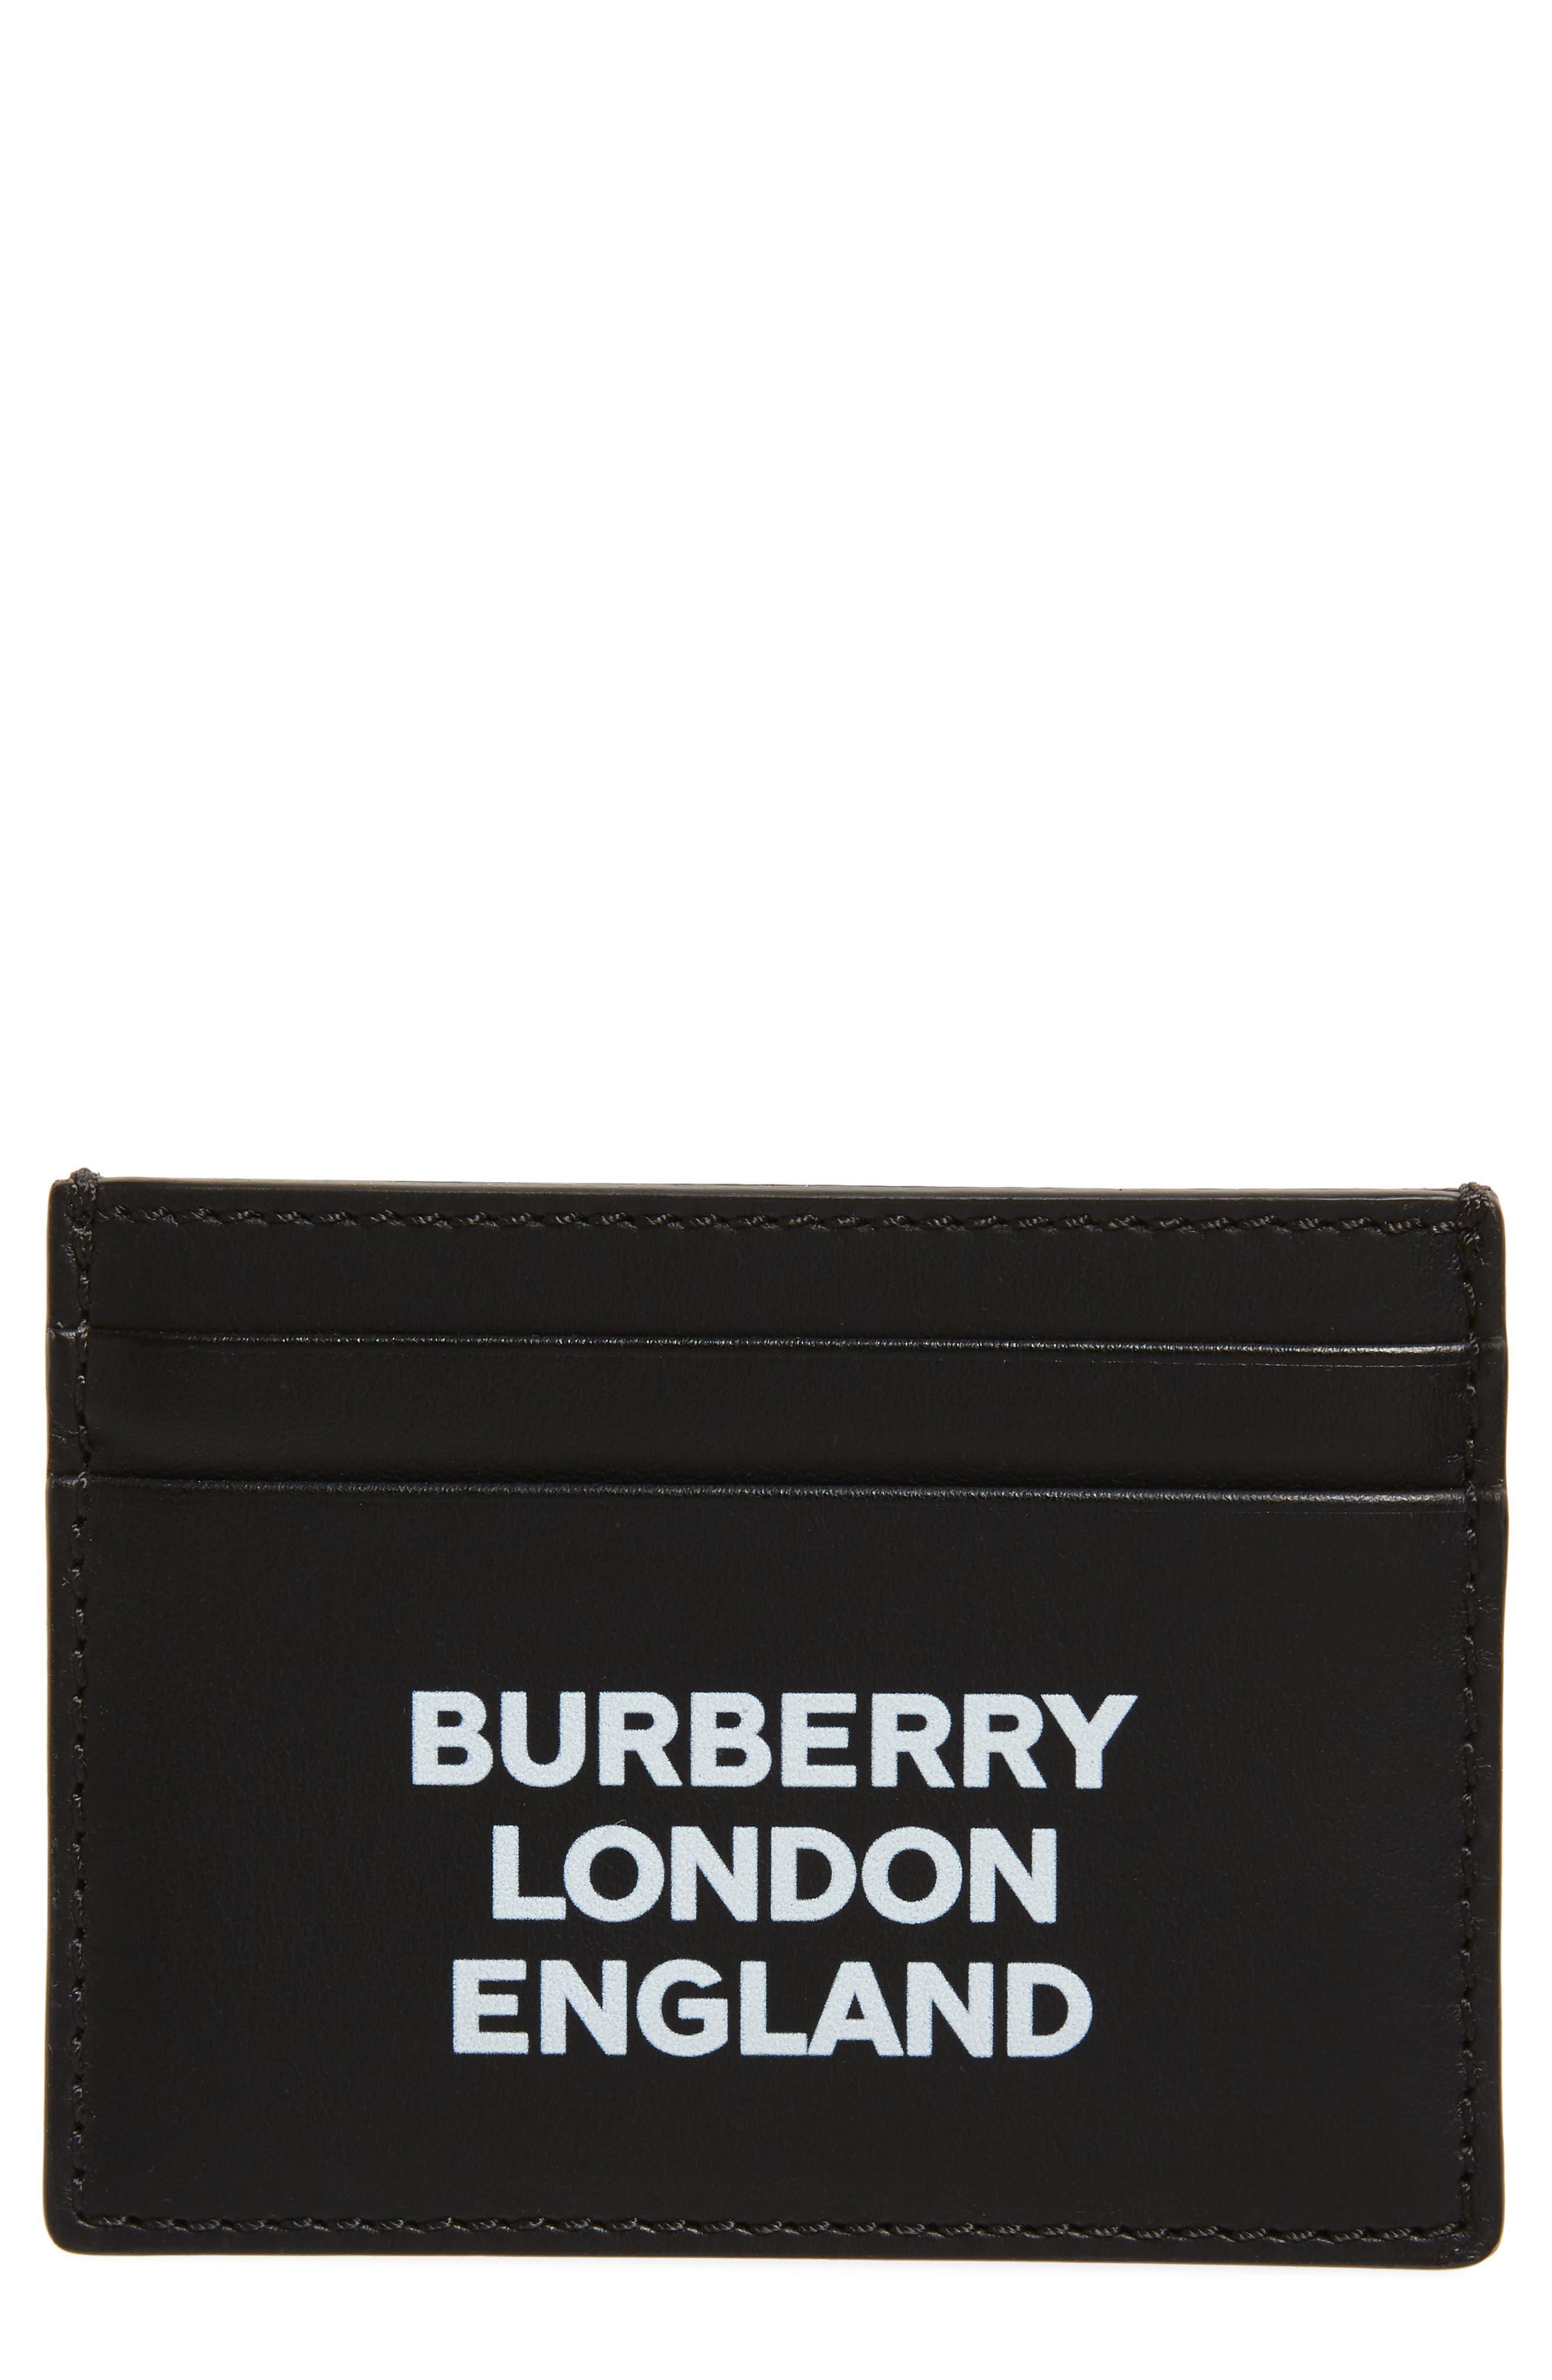 BURBERRY, Sandon Logo Leather Card Case, Main thumbnail 1, color, BLACK